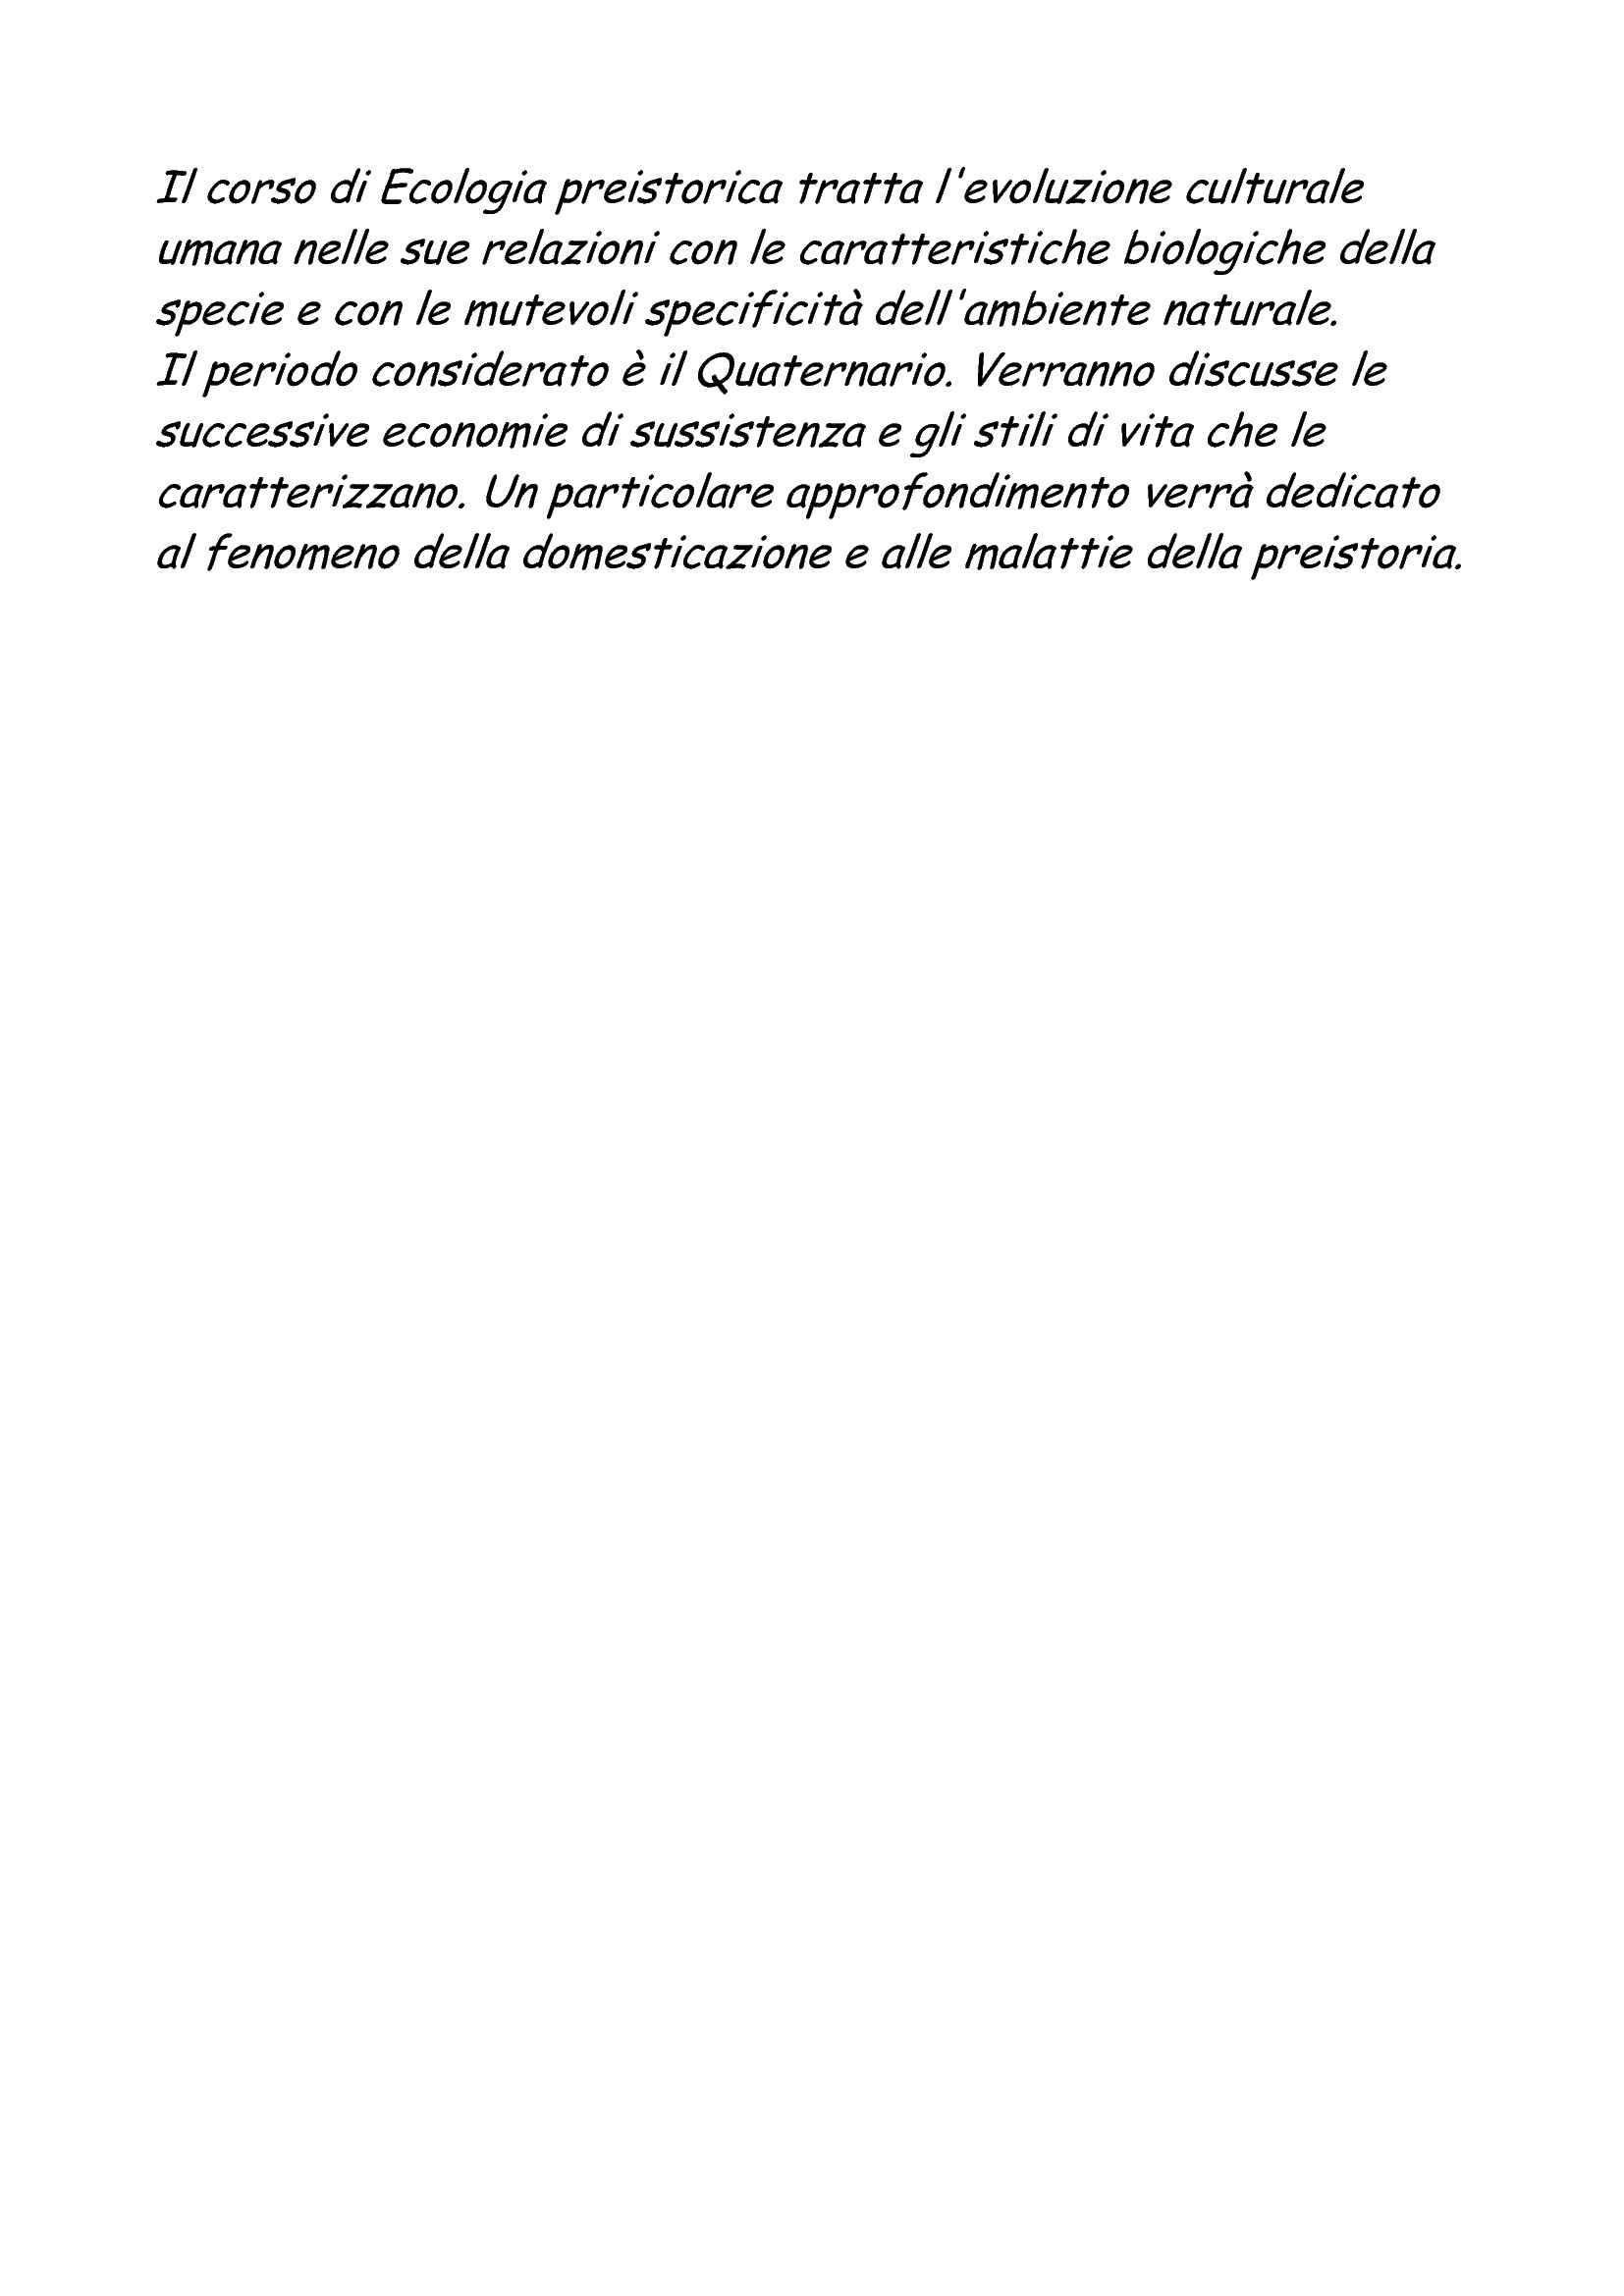 dispensa E. Marini Paleontologia umana ed Ecologia preistorica